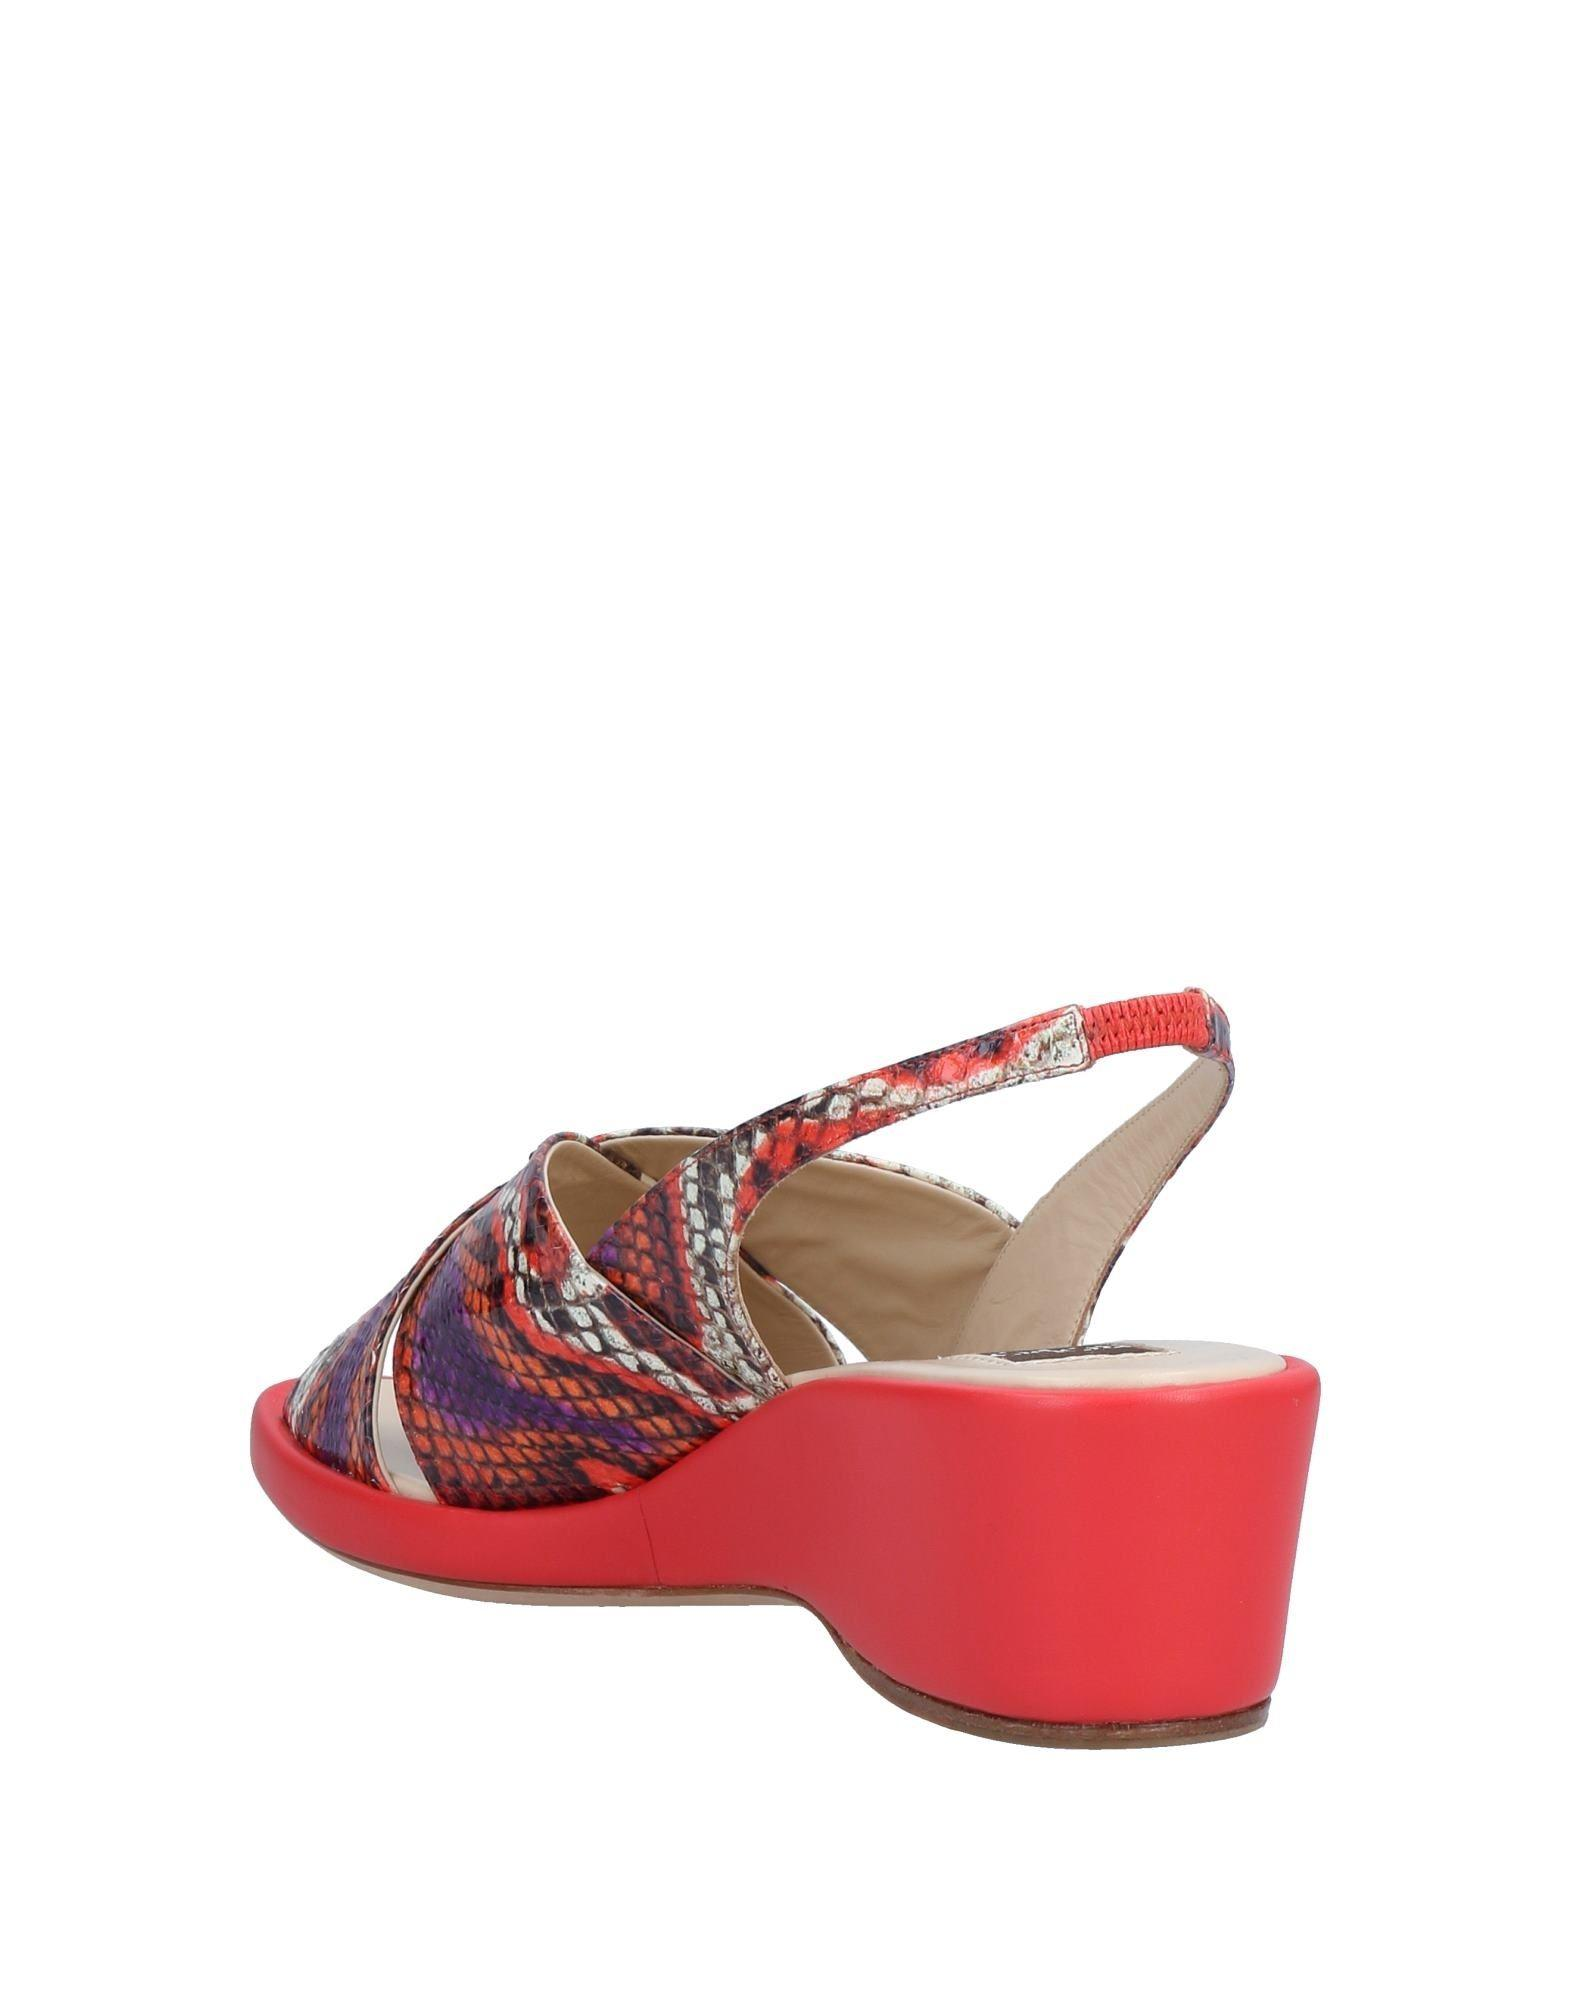 Sandales Rodo en coloris Rouge